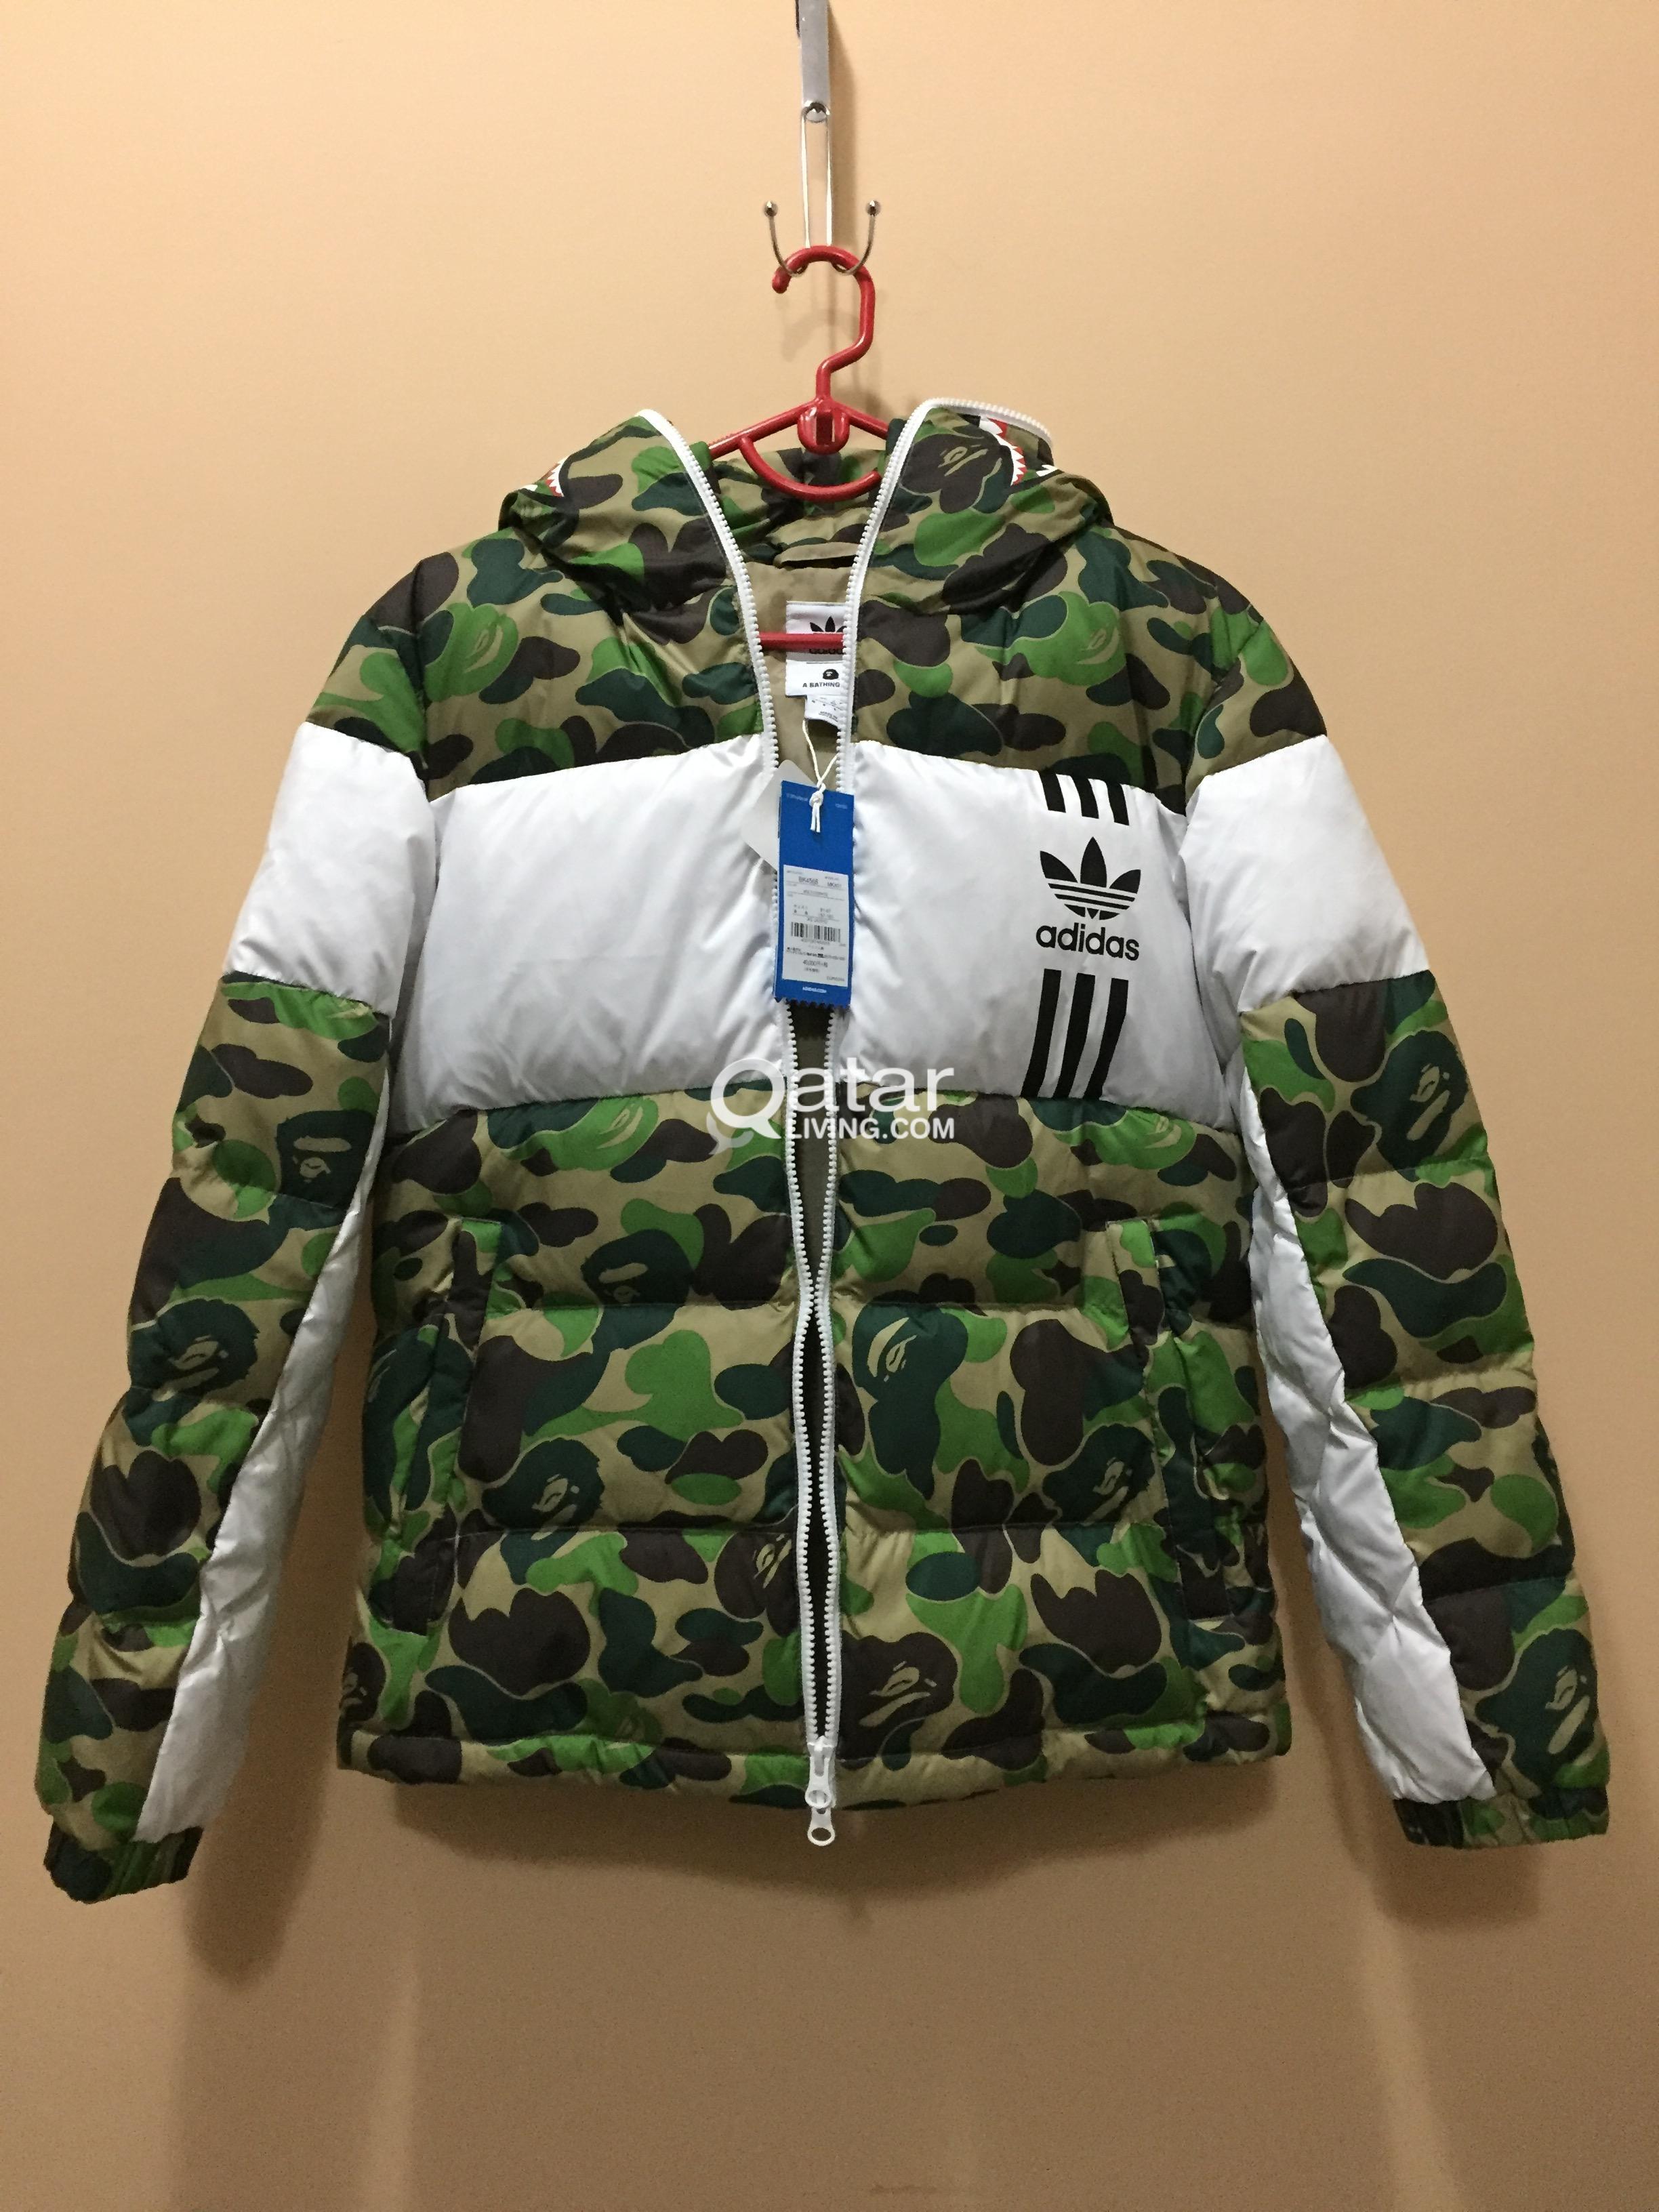 4e91407dc4e2 ... sneakerb0b RELEASES  title title ... Bape Bape X Adidas Shark Down  Jacket Size M ...